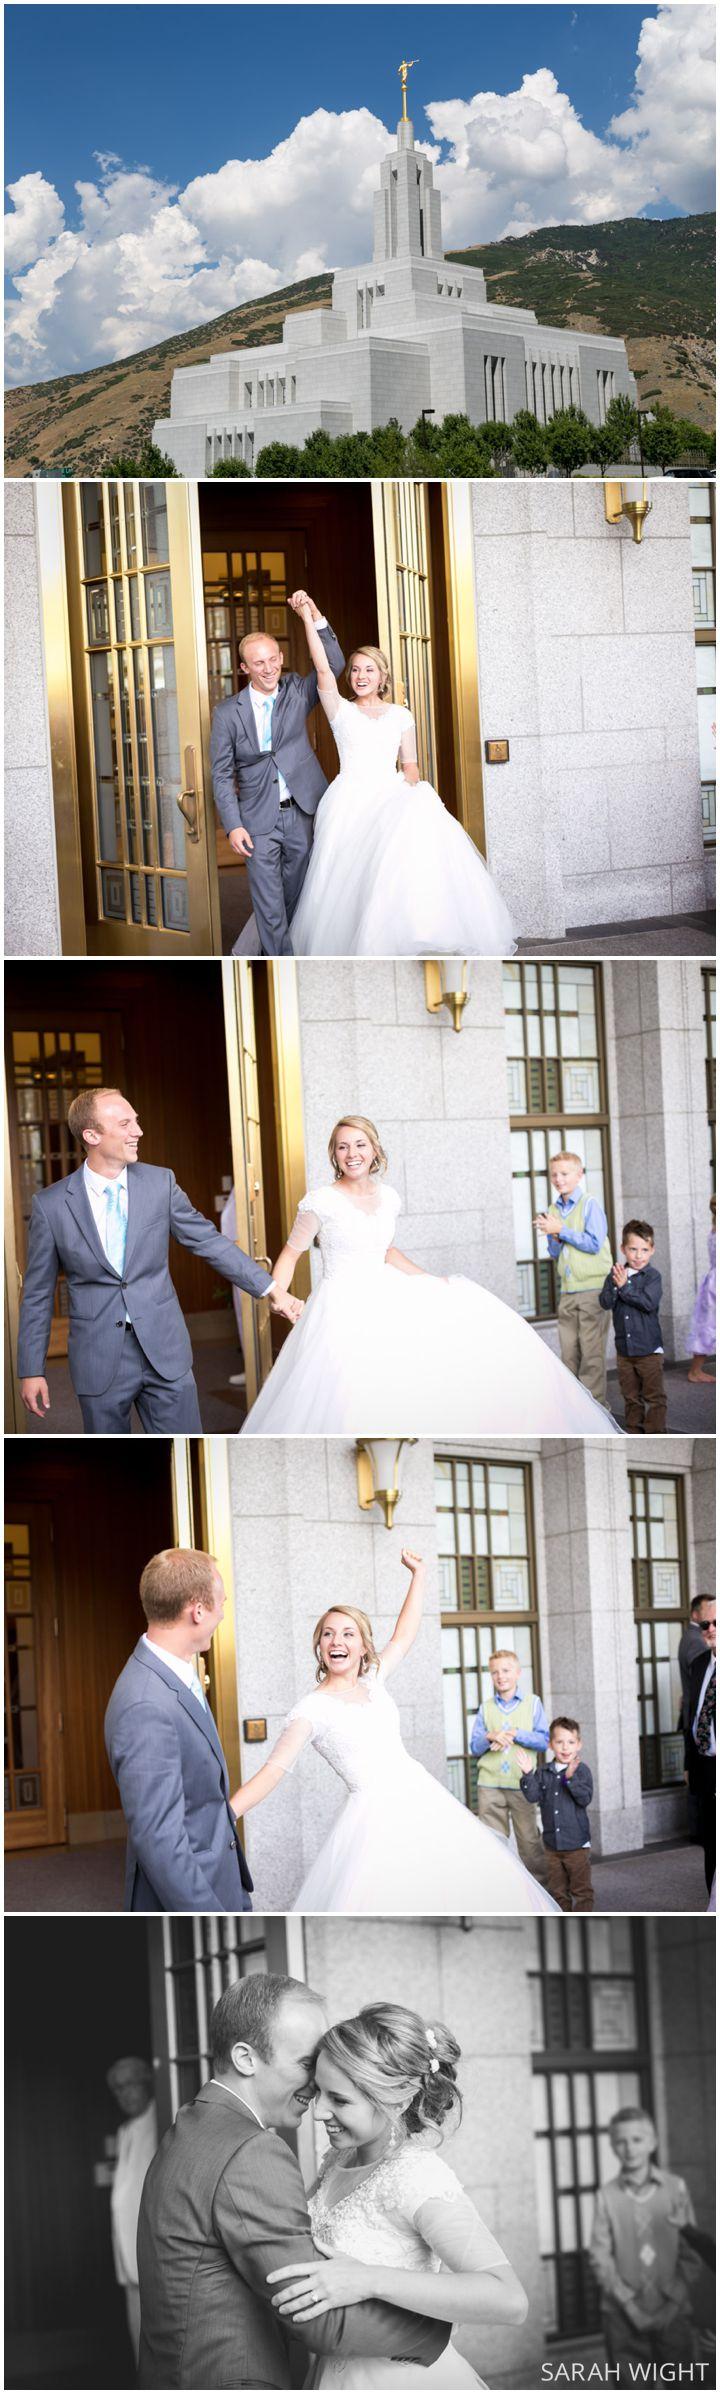 Utah Wedding Bungalow Draper Photographer-1.jpg